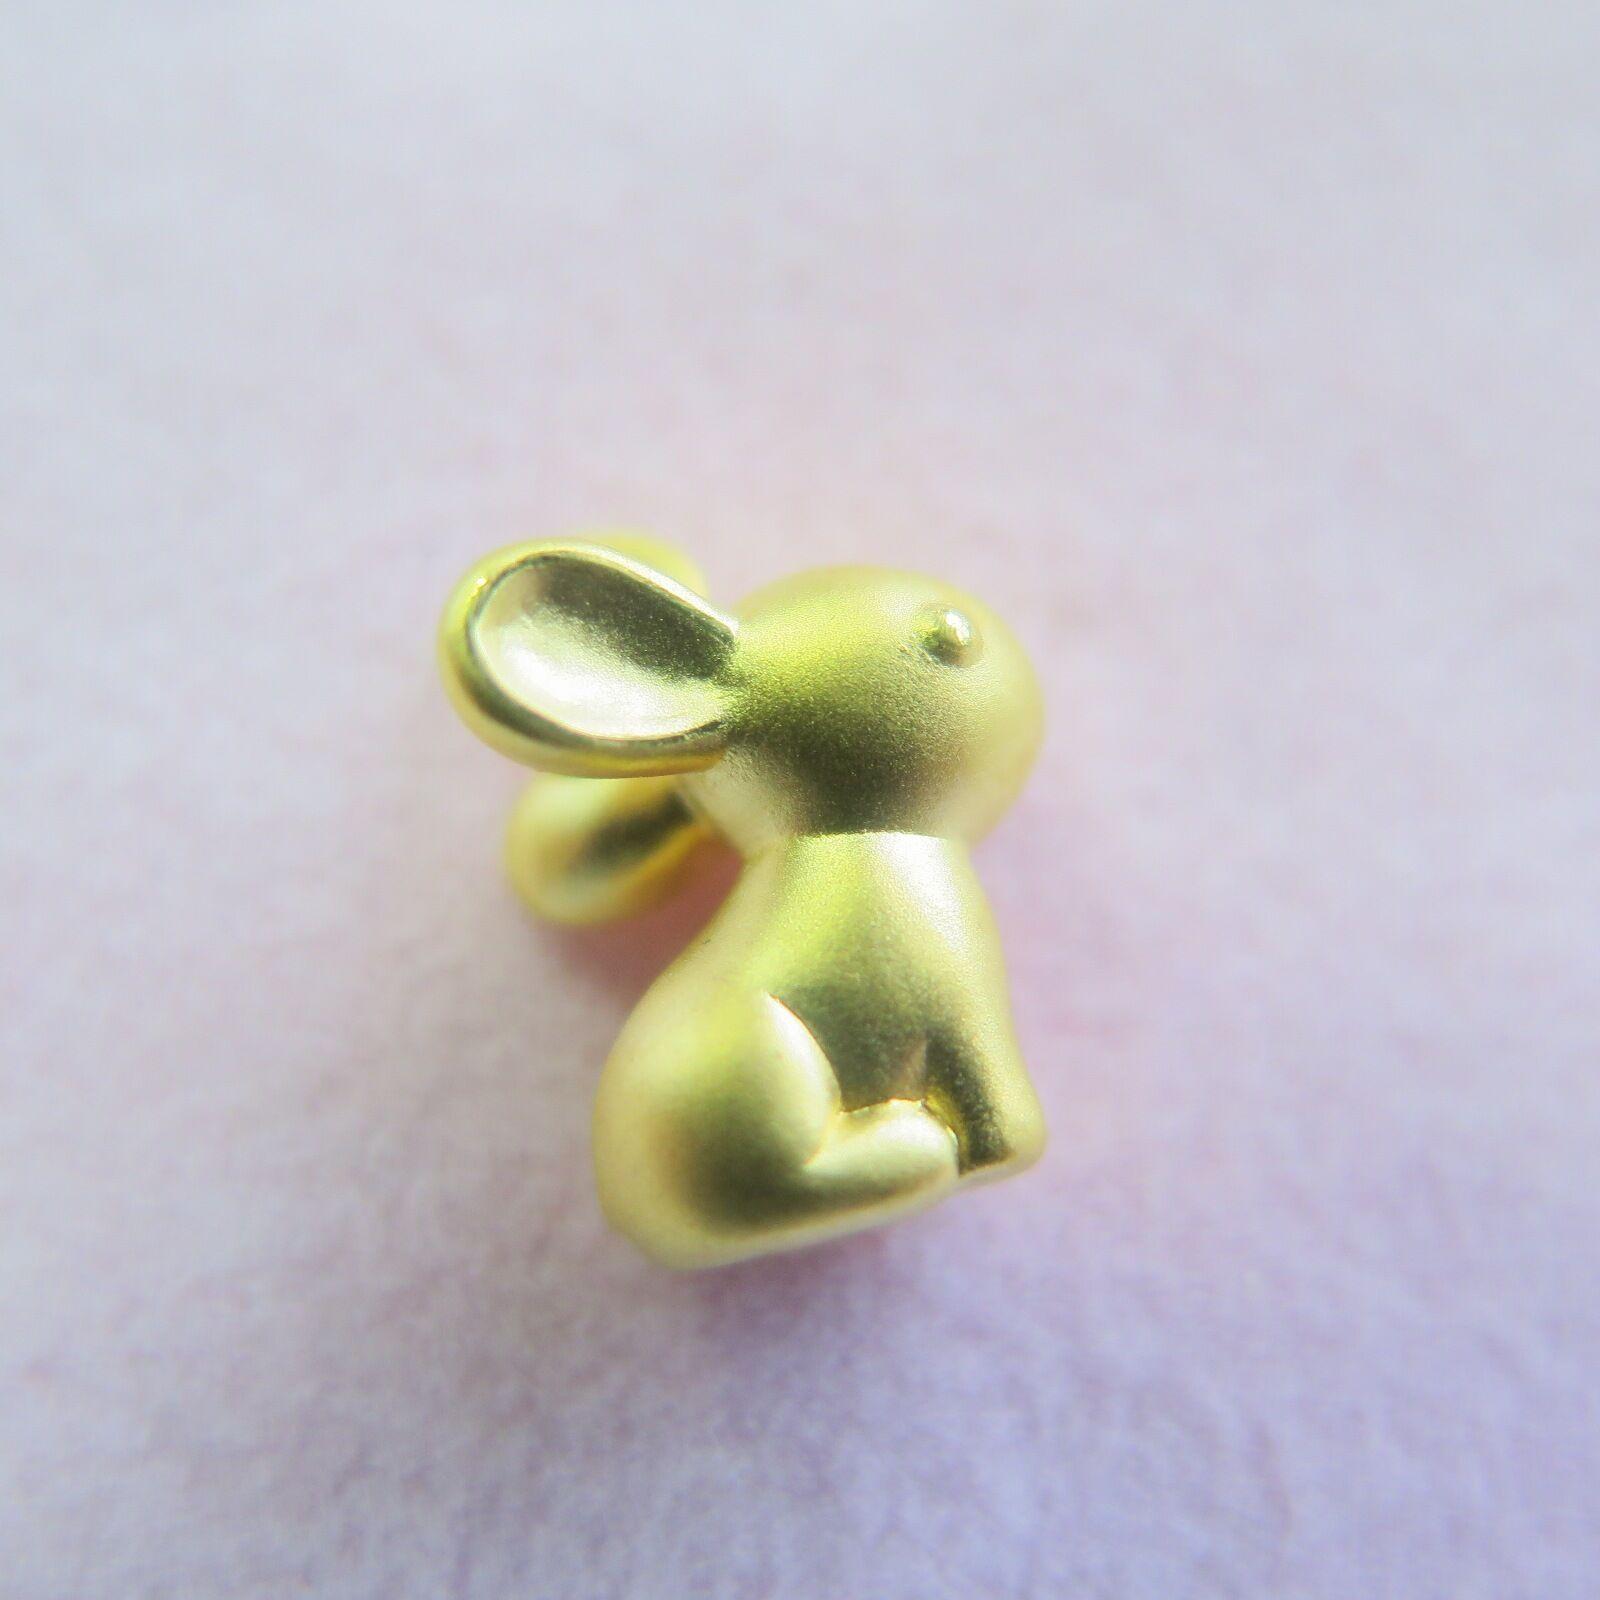 Real Pure 999 24k Yellow gold Pendant    3D Cute Rabbit Pendant   1g